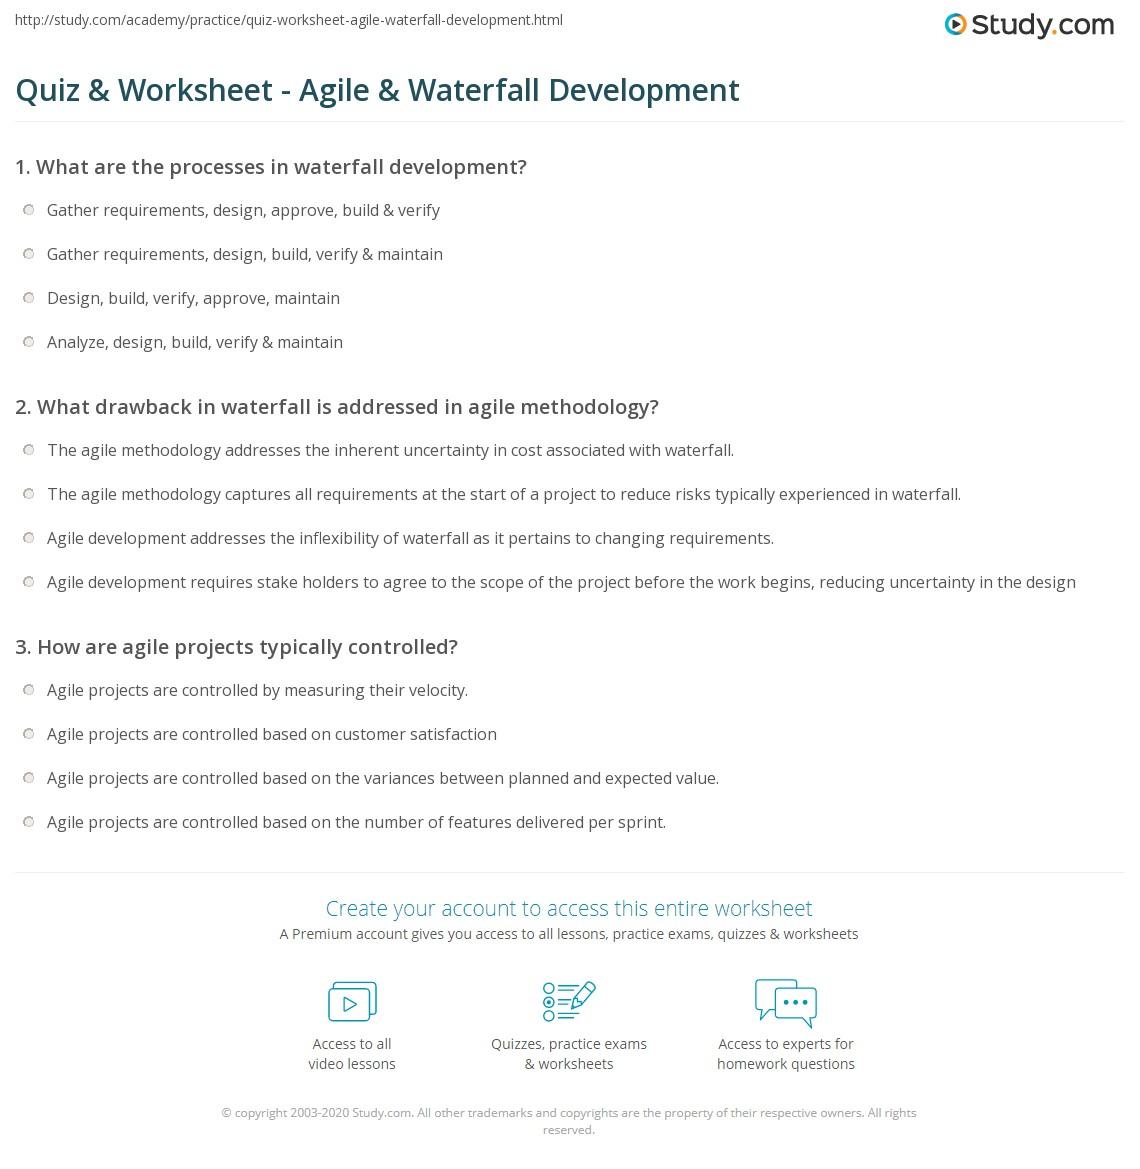 Quiz & Worksheet - Agile & Waterfall Development | Study com